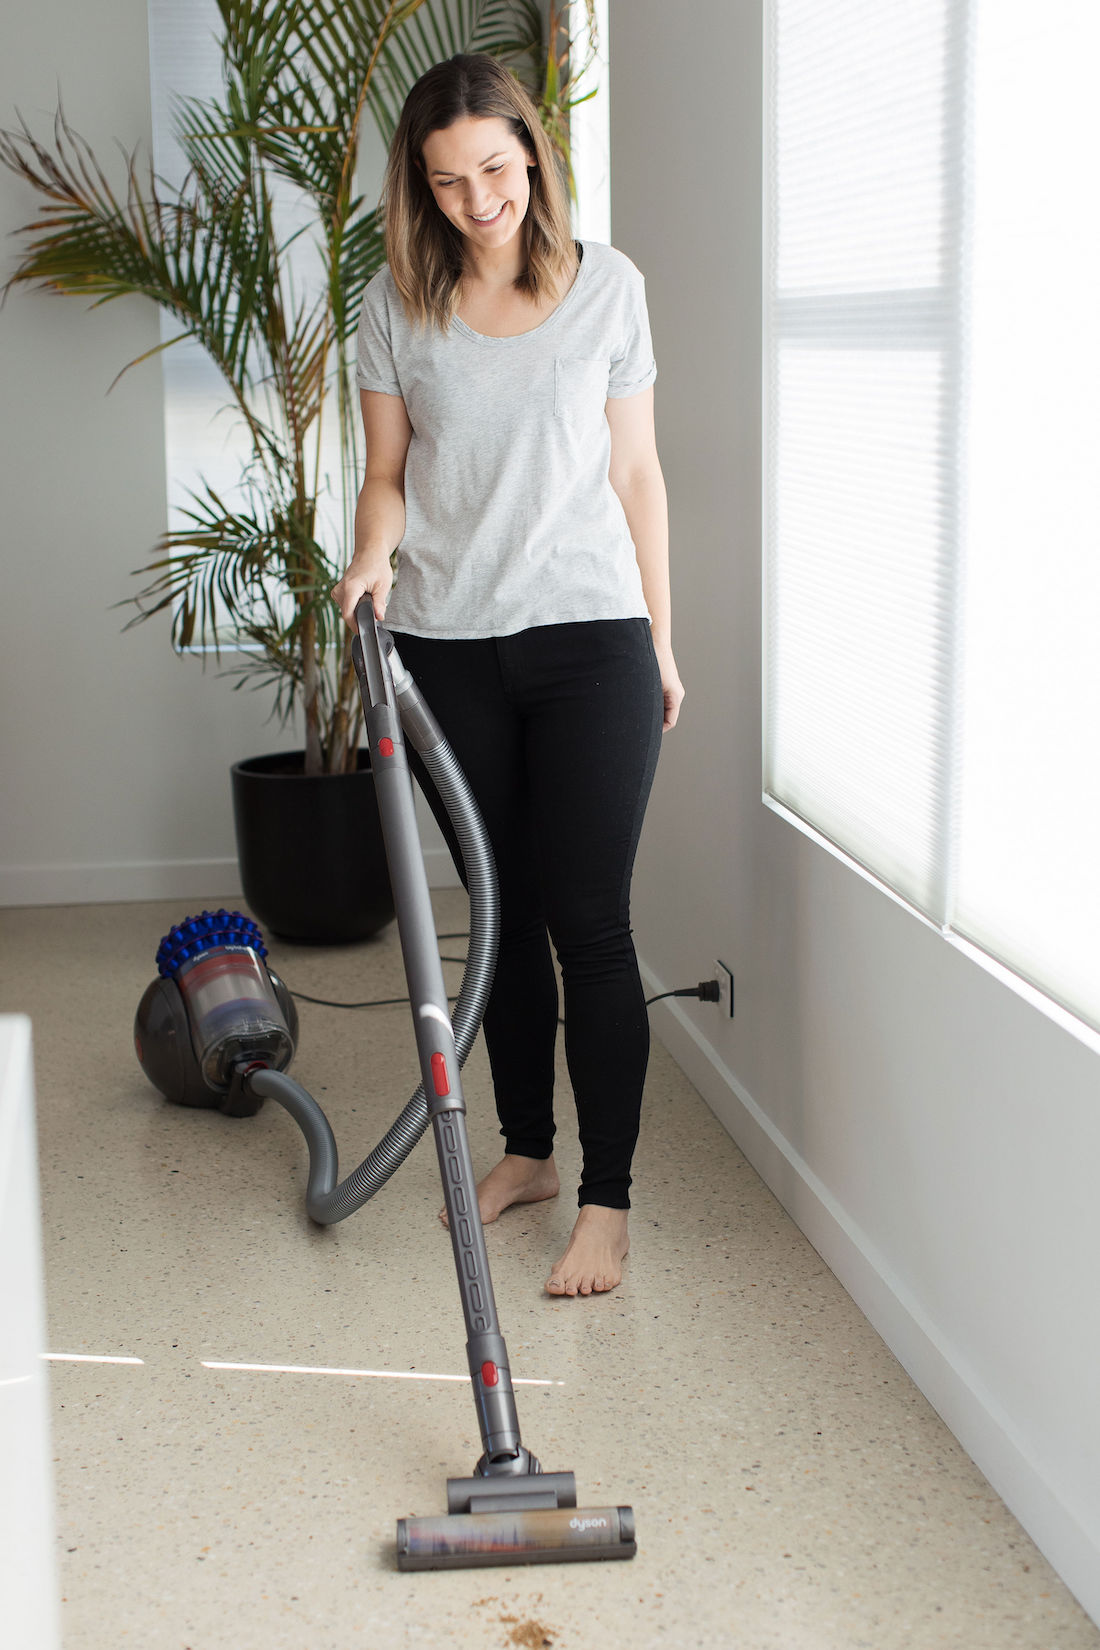 Vacuuming sand